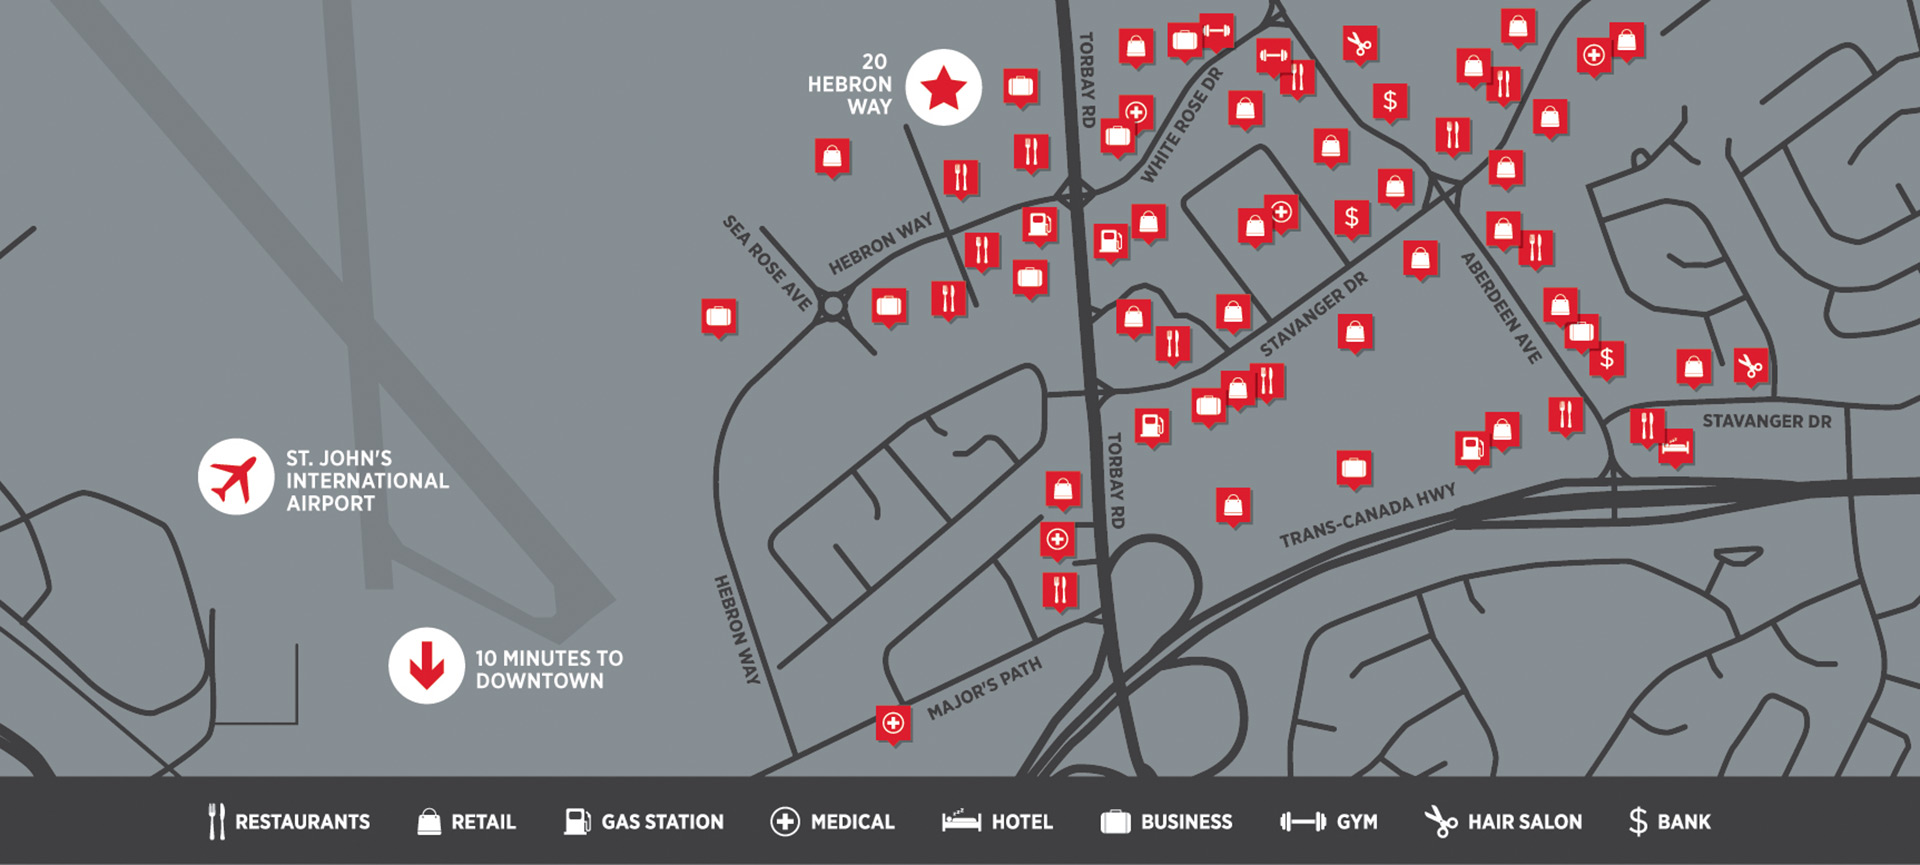 Map_Zoomout-01.jpg